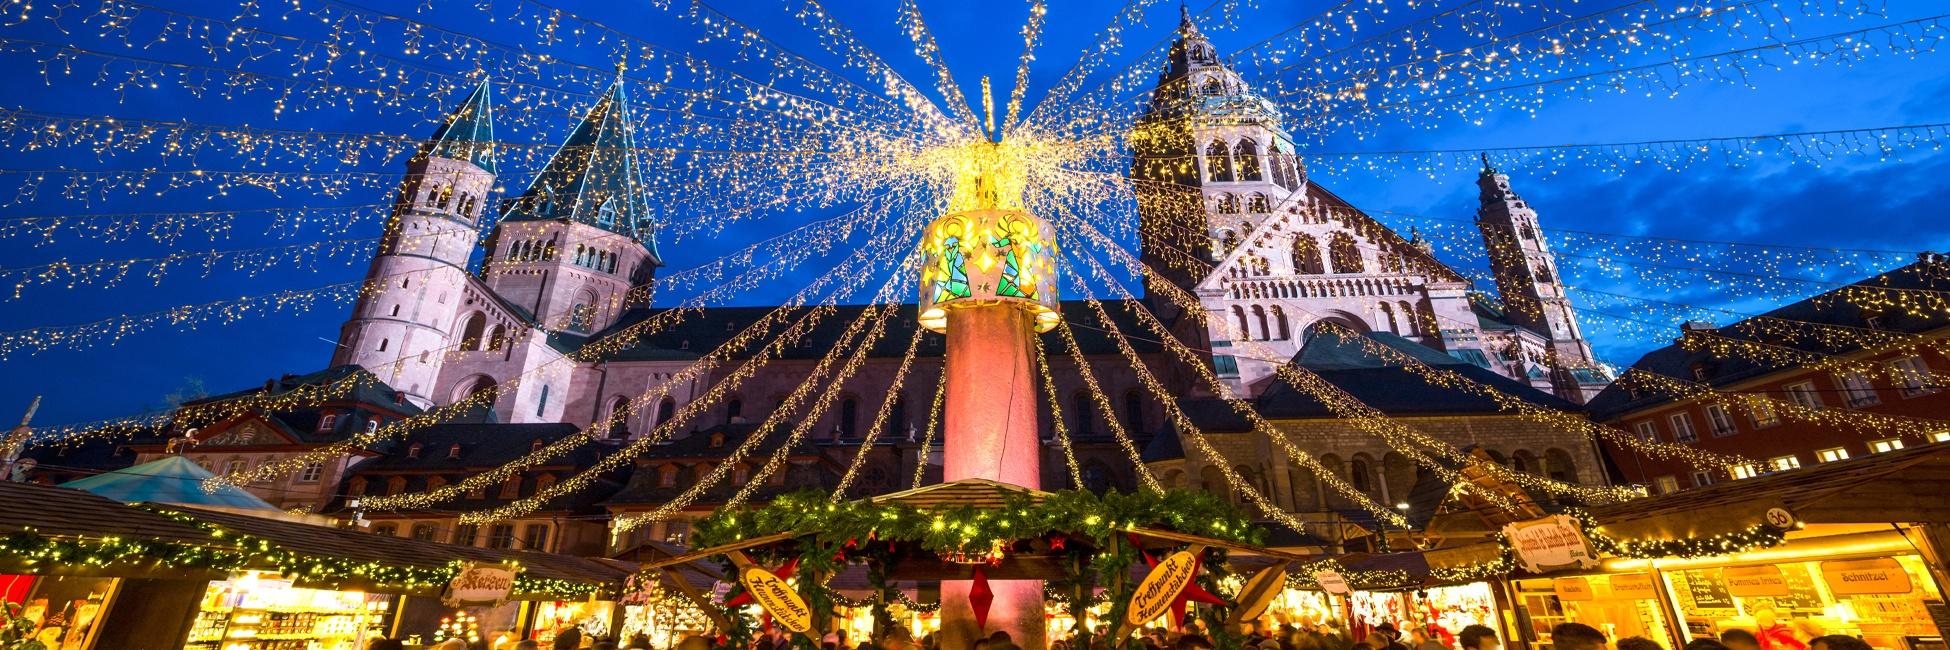 Marchés de Noël de Mayence